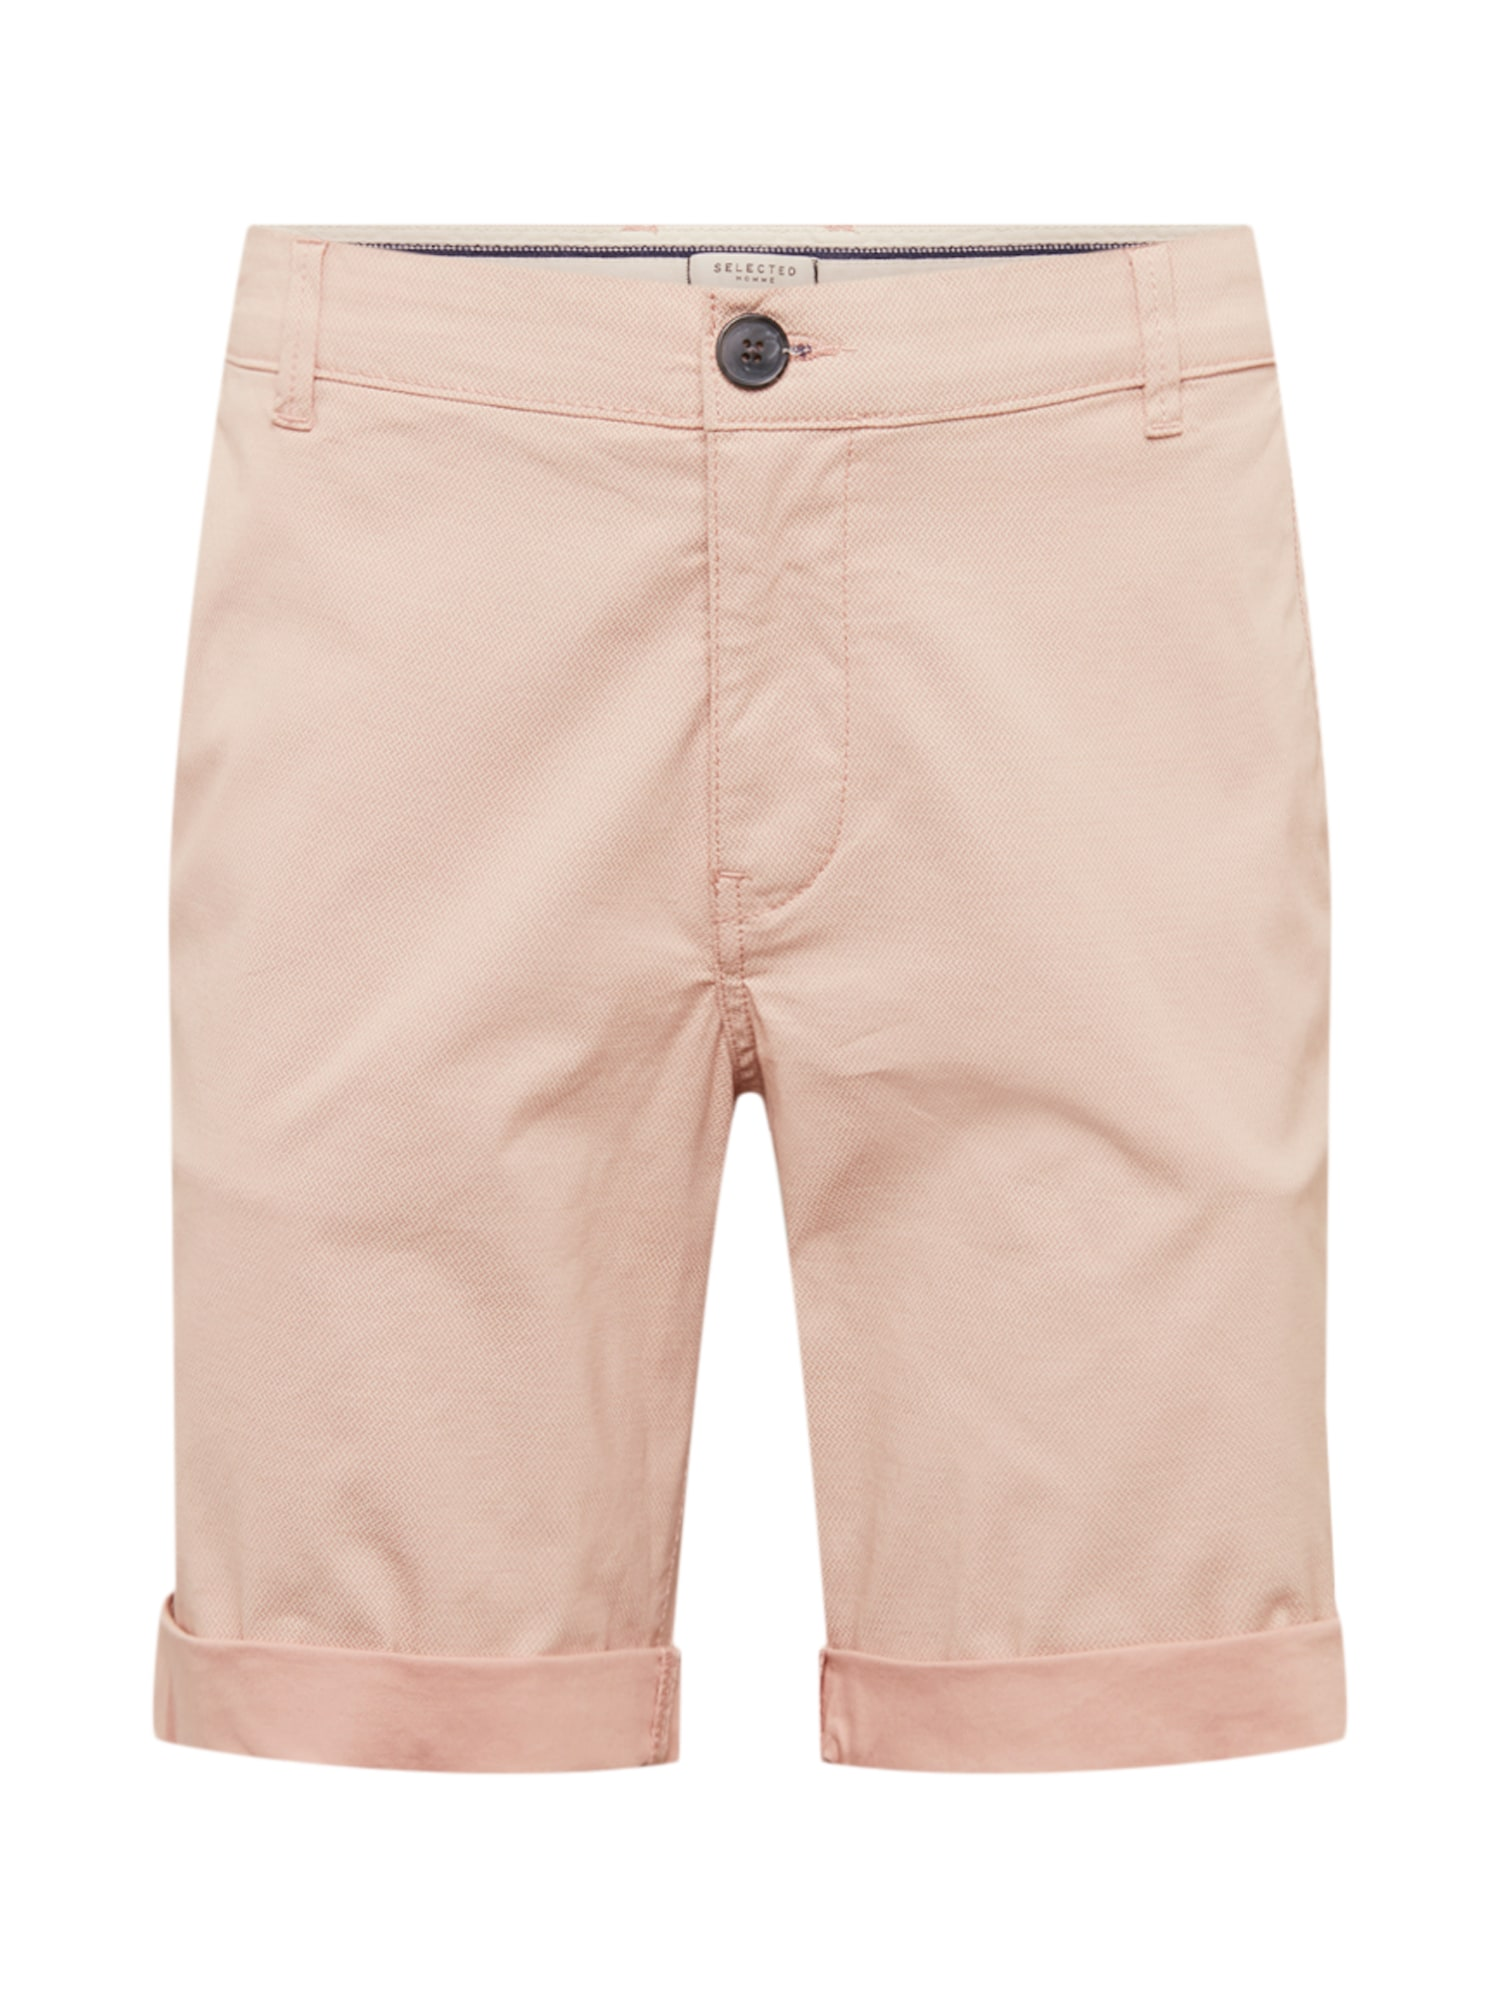 Chino kalhoty Paris růžová SELECTED HOMME